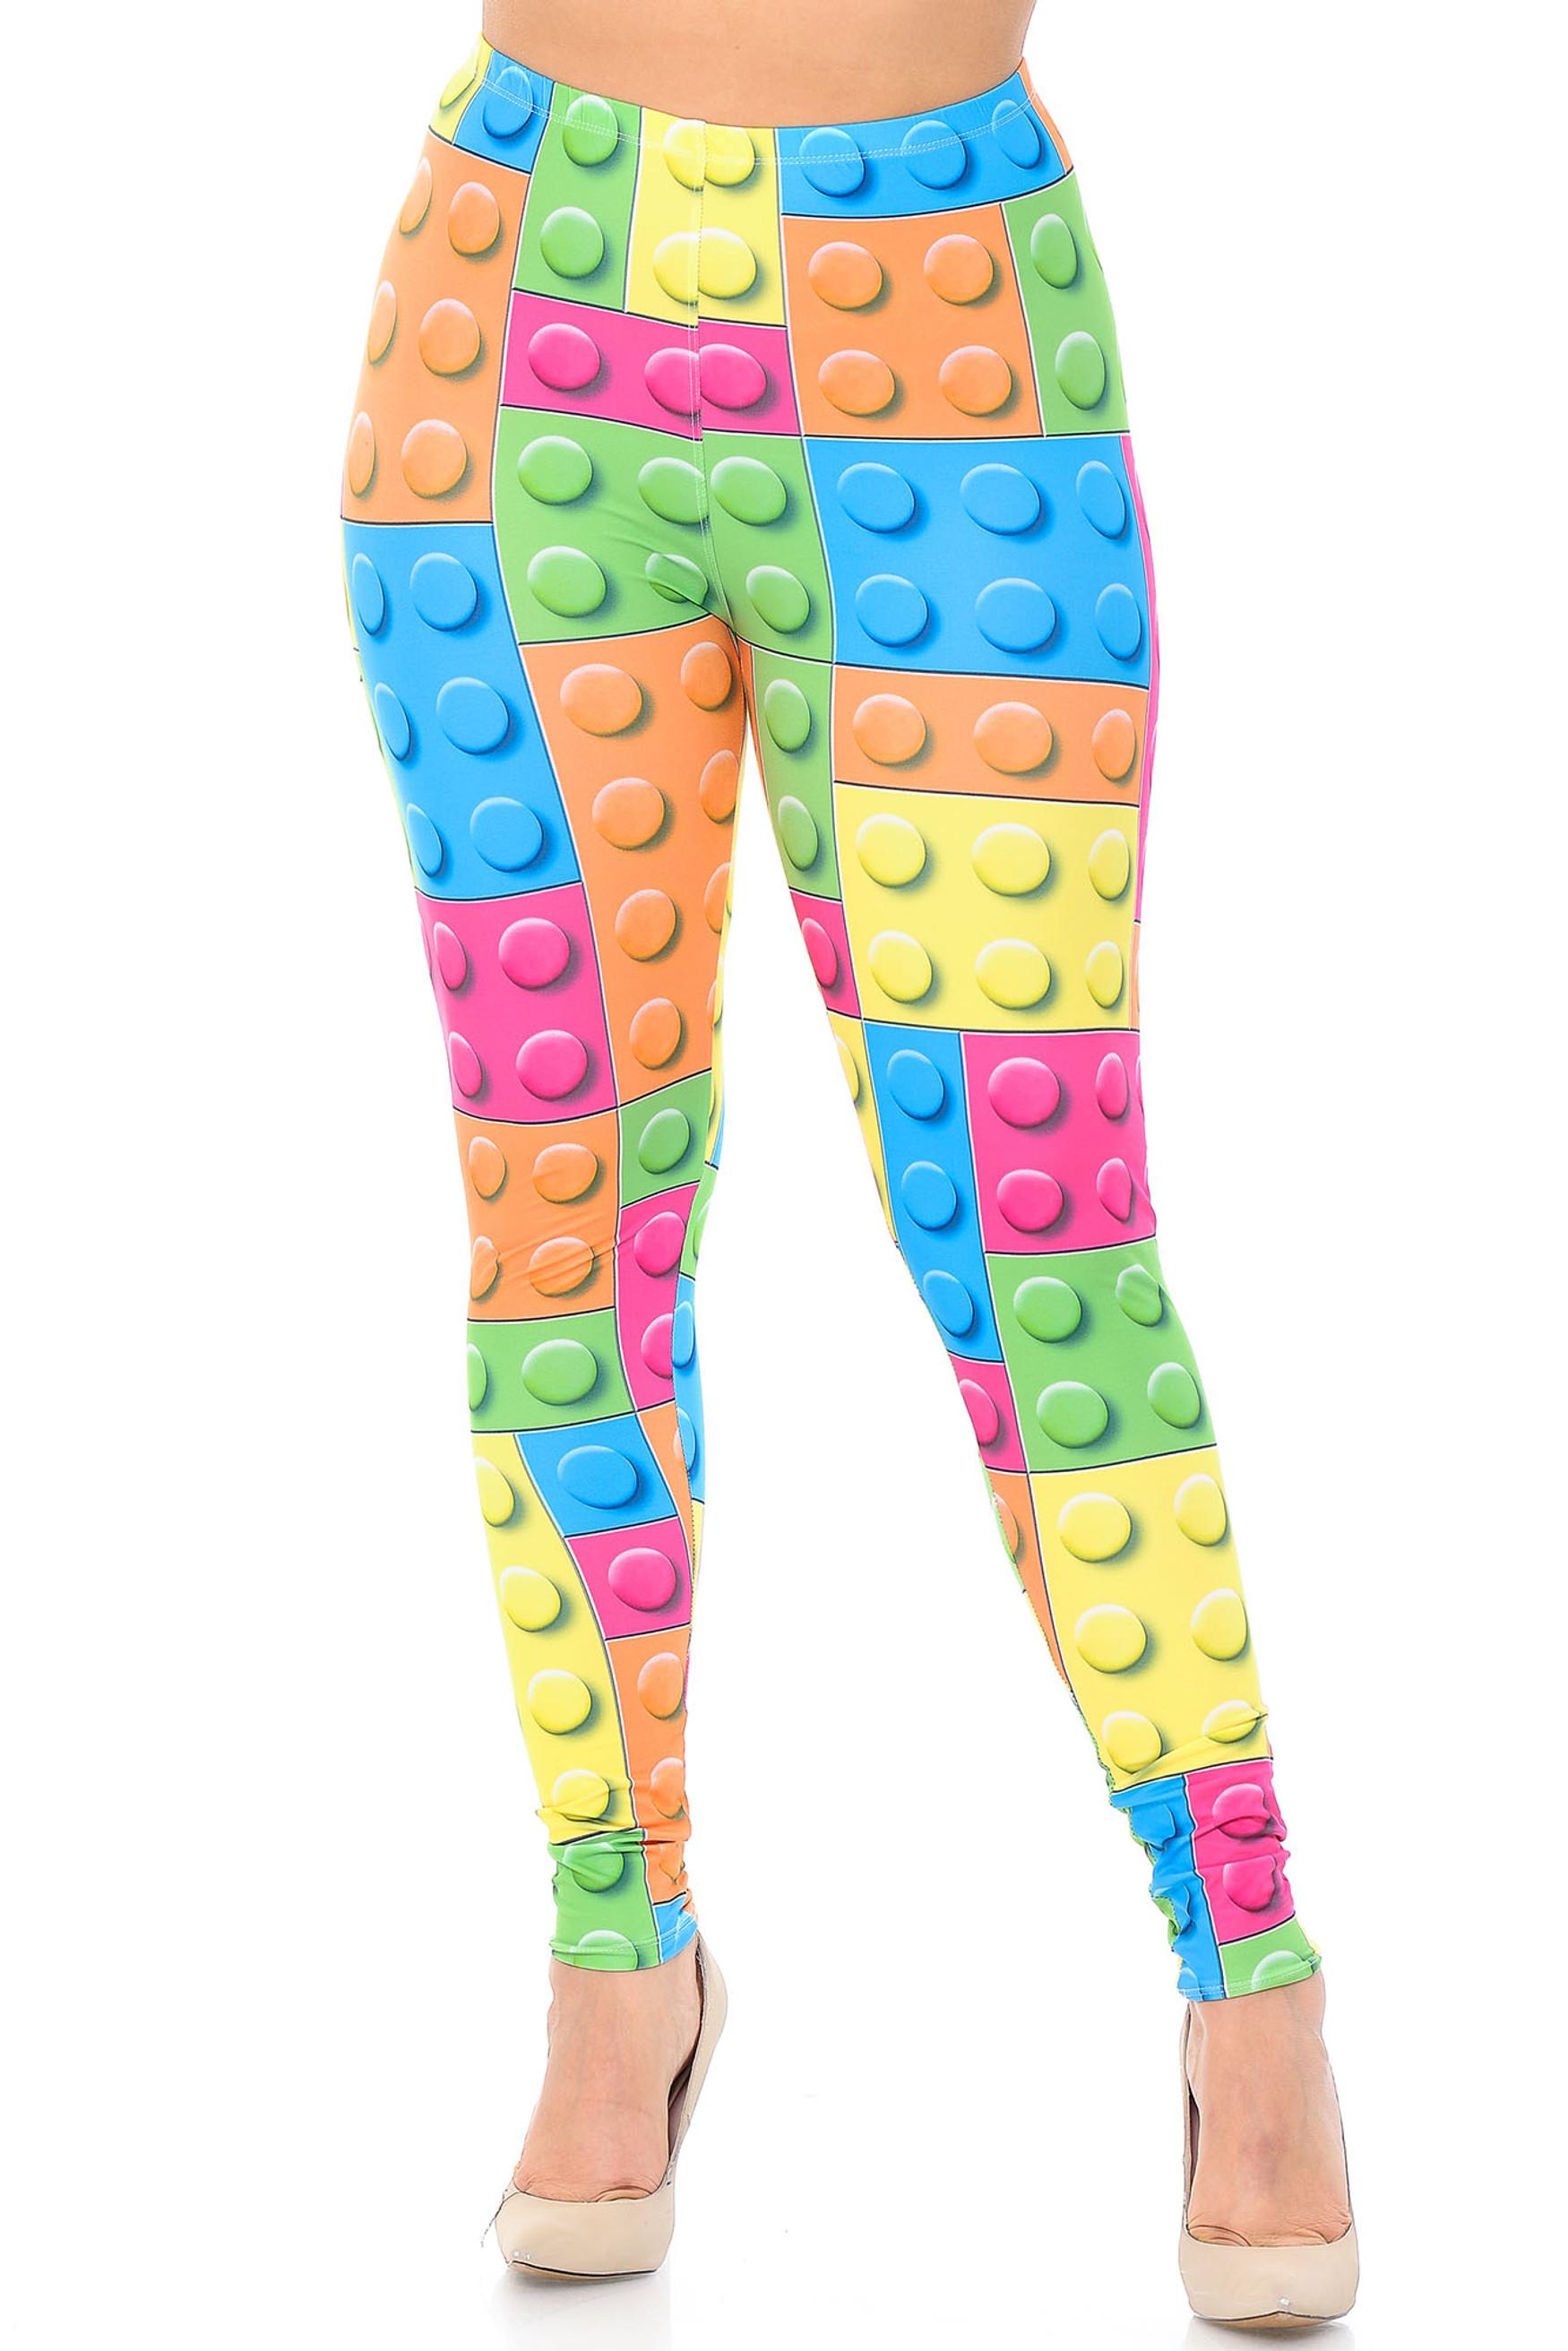 Creamy Soft Lego Extra Plus Size Leggings - 3X-5X - USA Fashion™